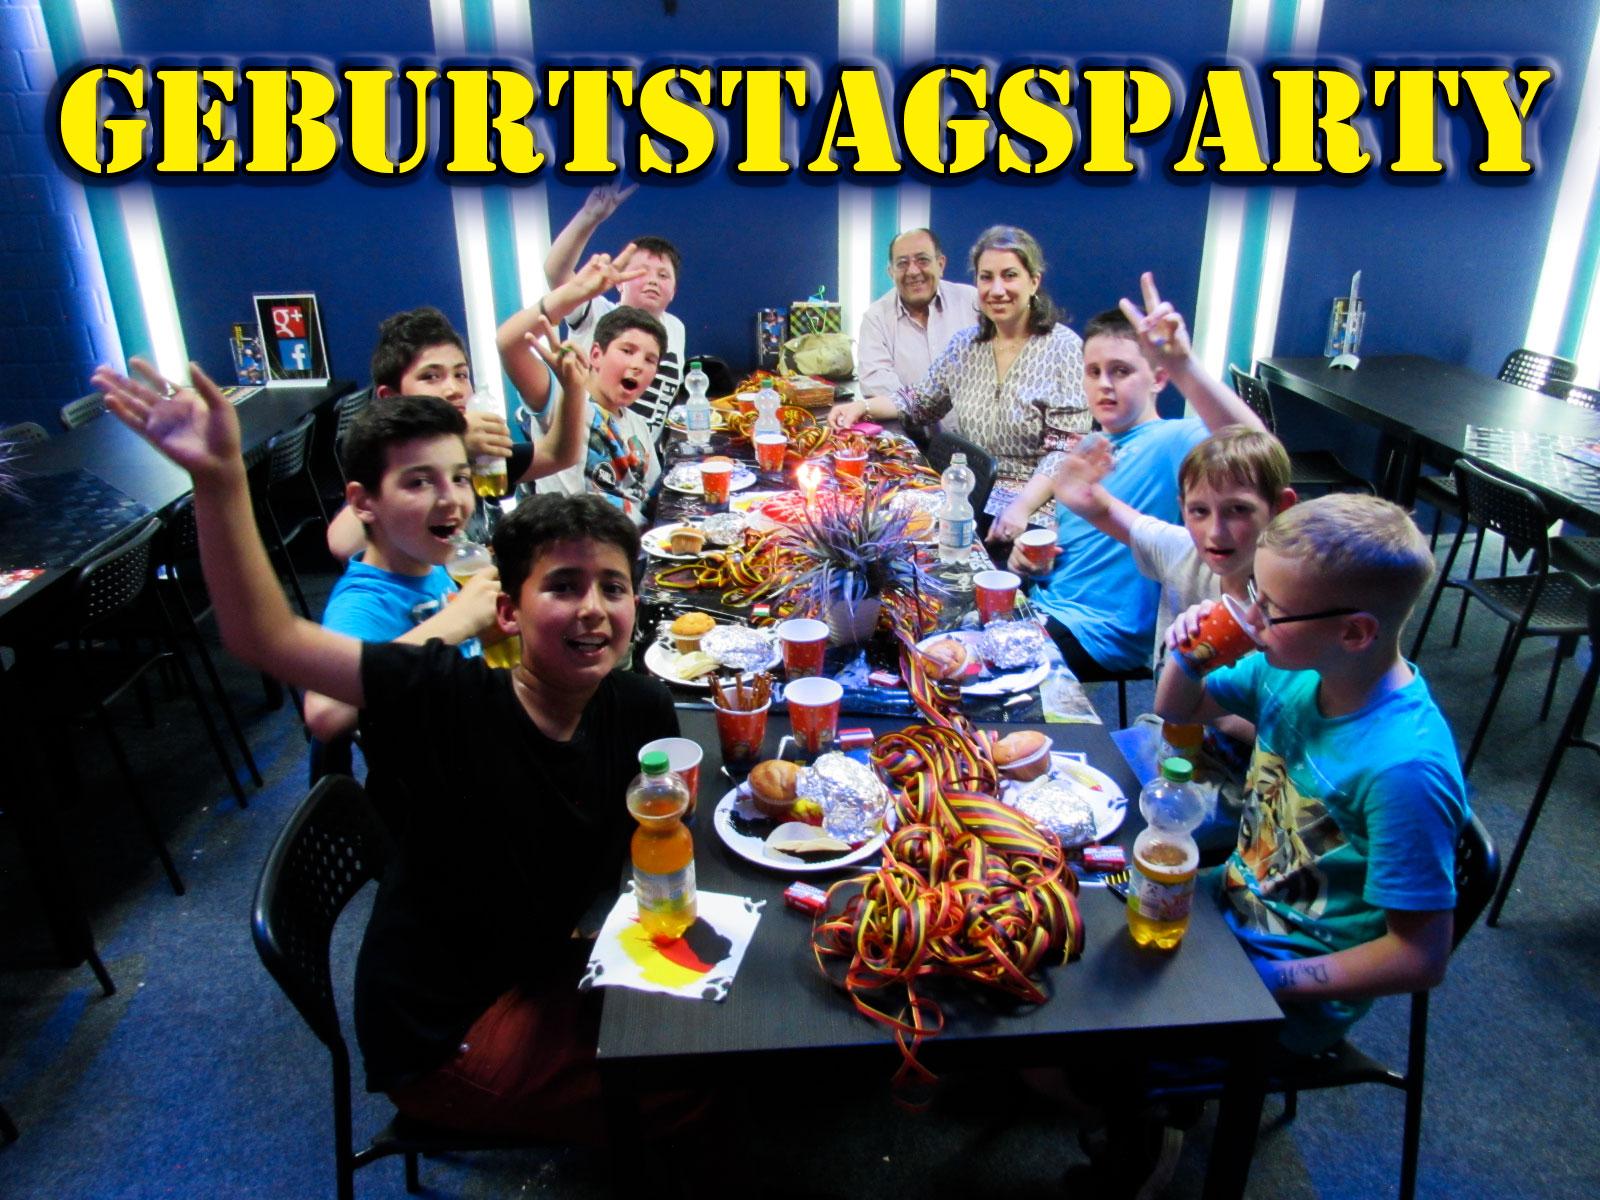 Geburtstag Lasertag Hannover Kindergeburtstag Lasergame